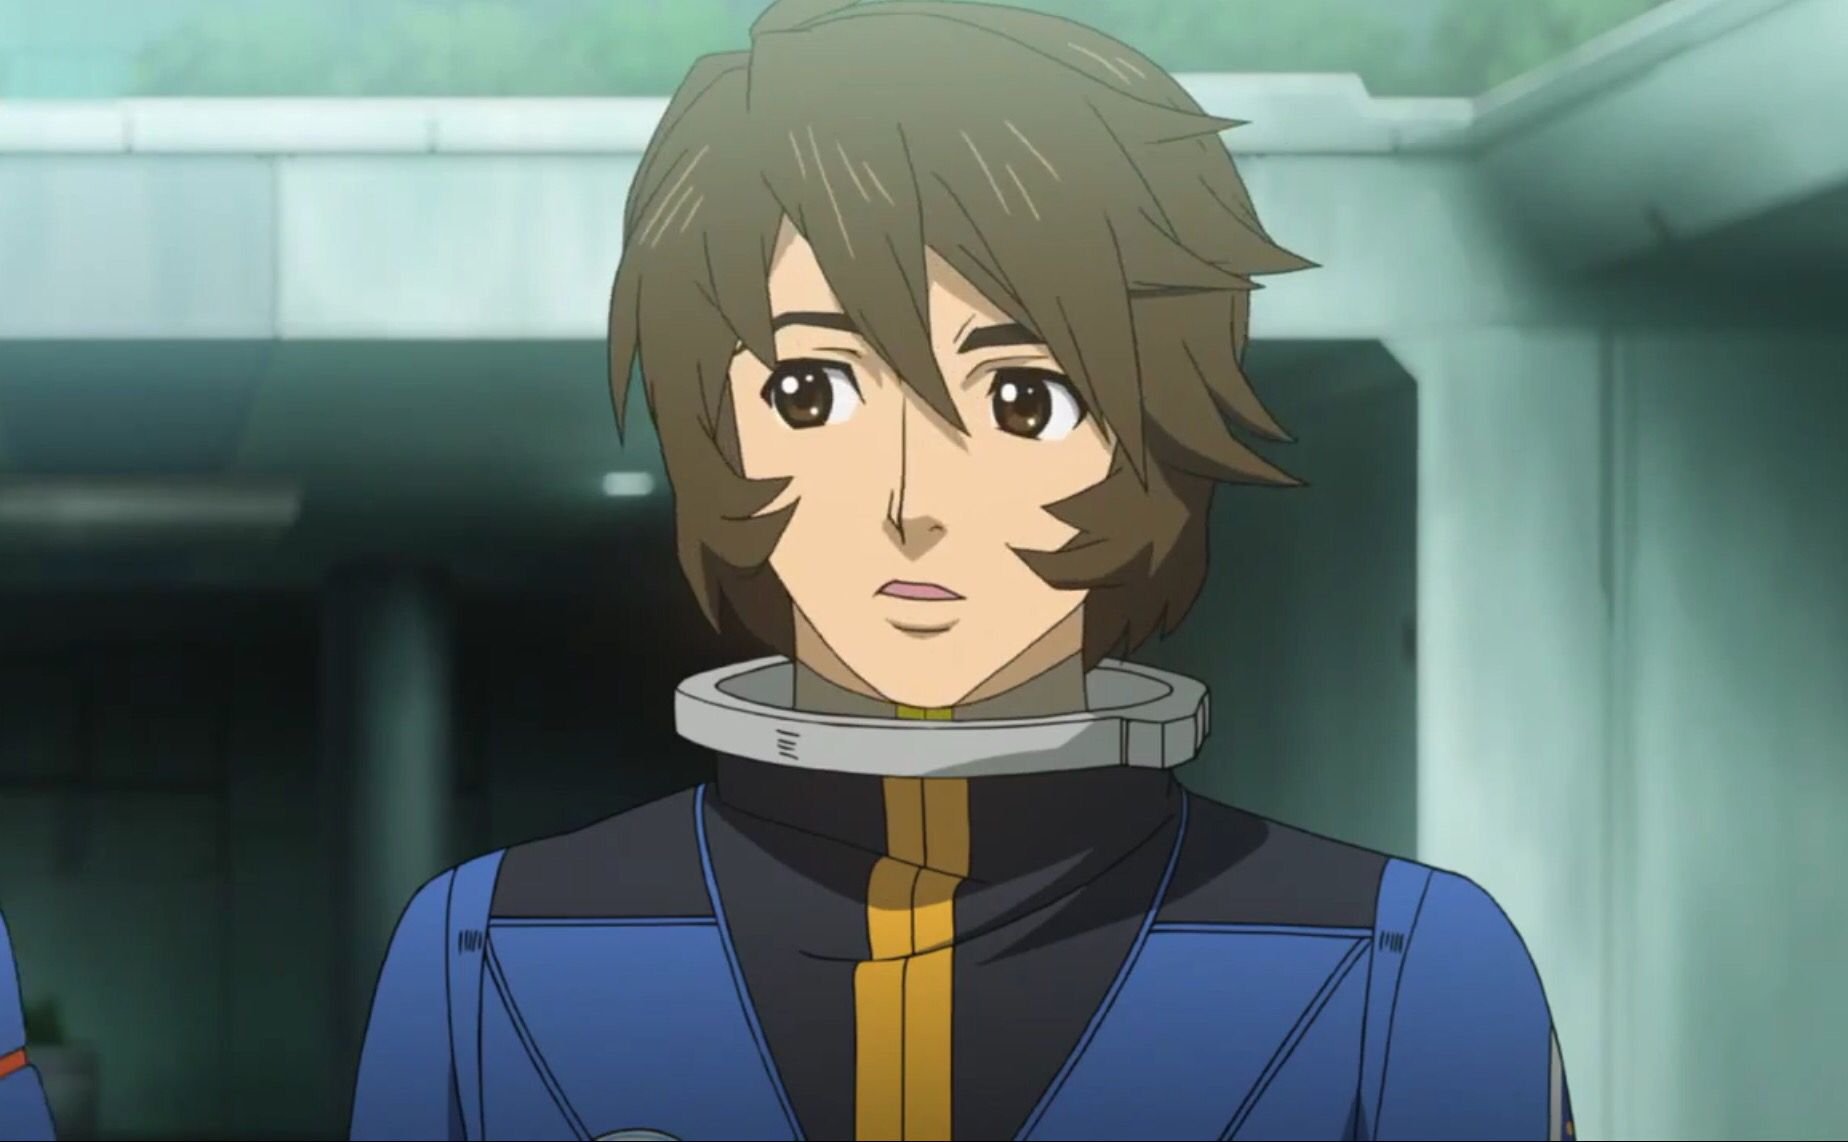 Episode 1 Yamato 2199 The incredibles, Yamato, Star blazers